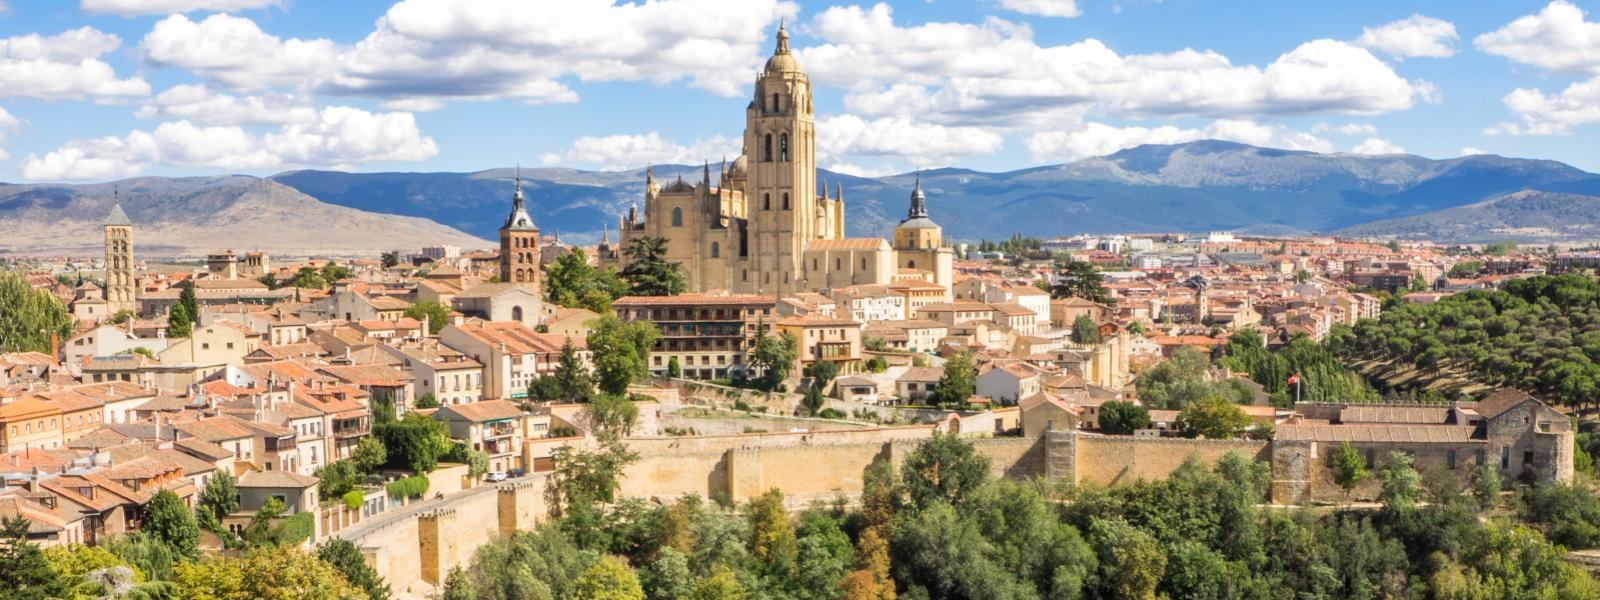 aerial photo of Segovia, Spain